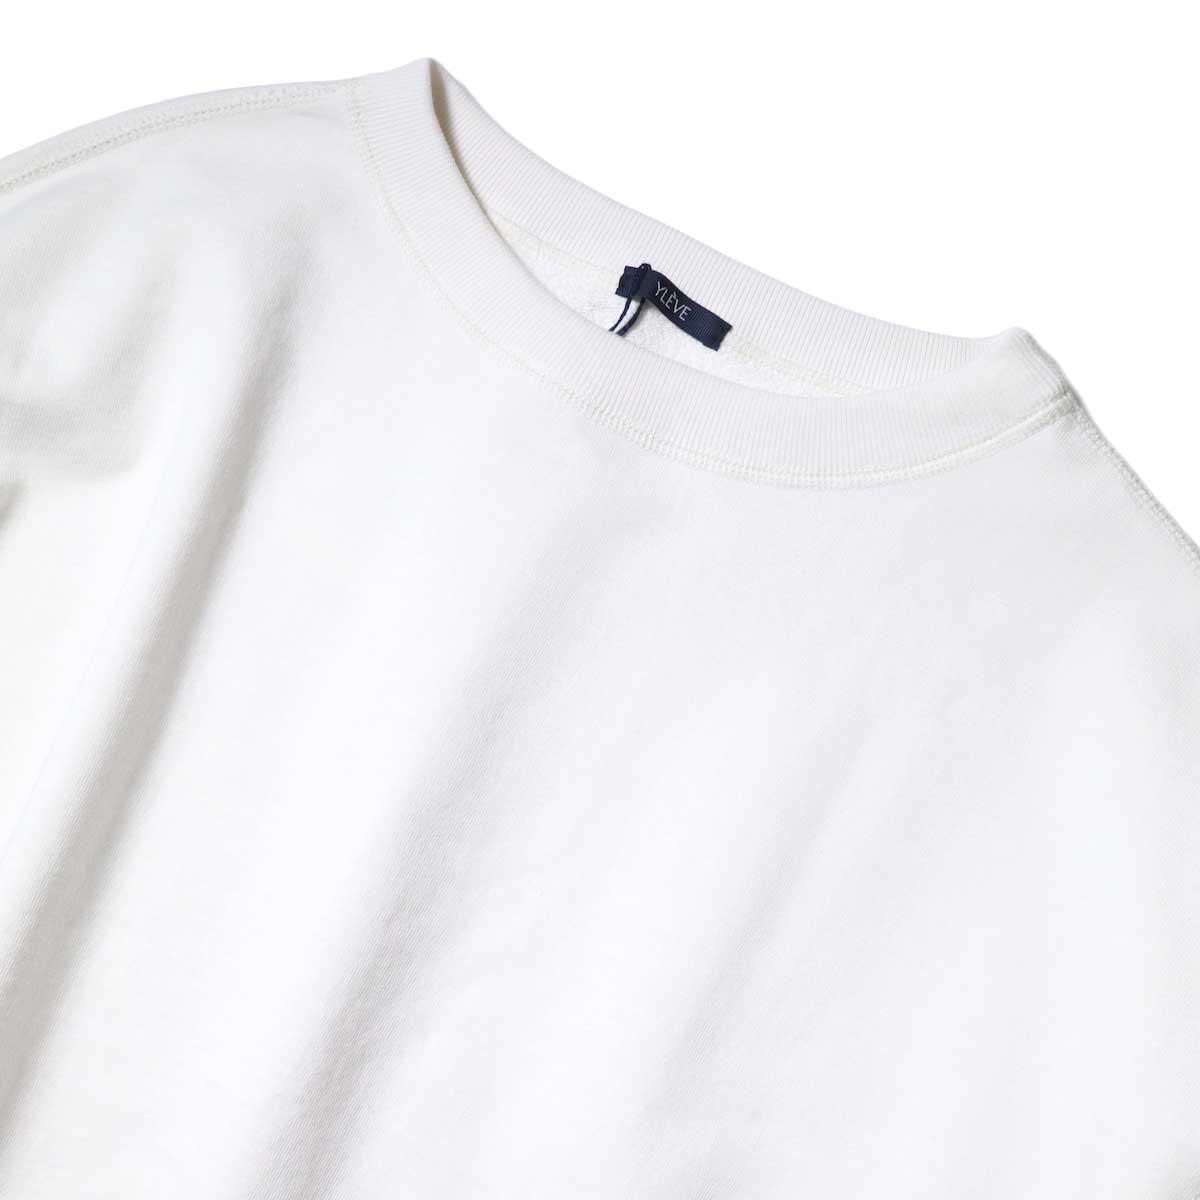 YLEVE / SUVIN CTN CUTOFF BIG (White) ネック